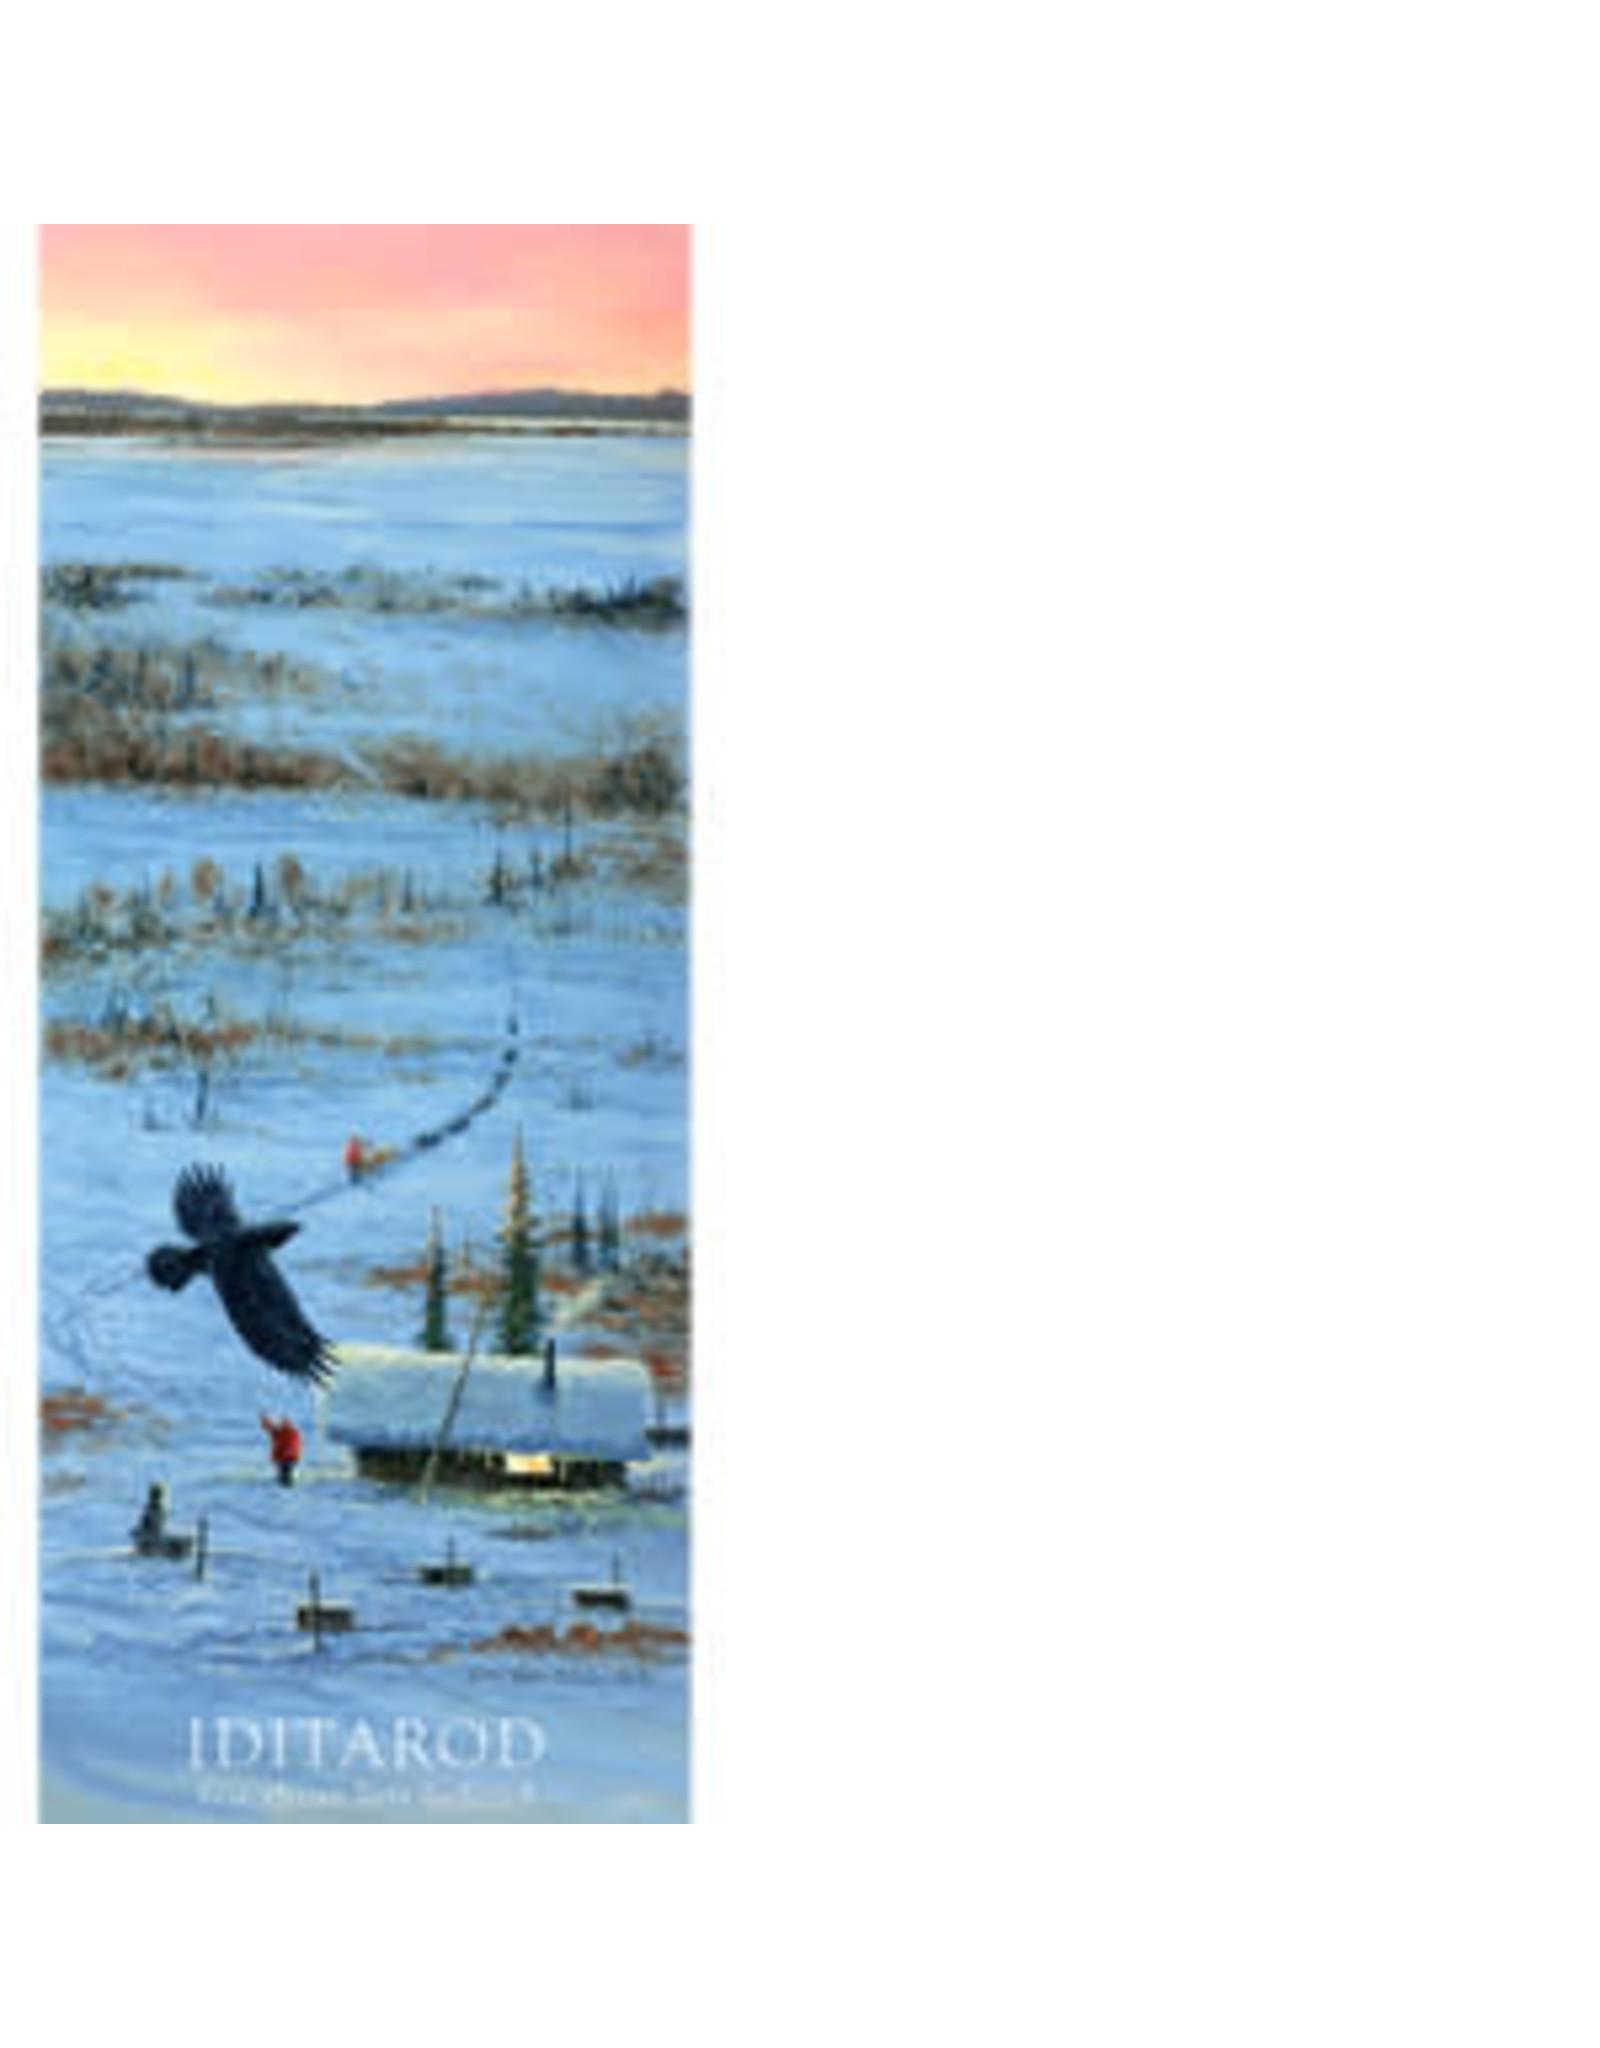 Jon Van Zyle For Those Left Behind (2017 Iditarod Poster) | Jon Van Zyle